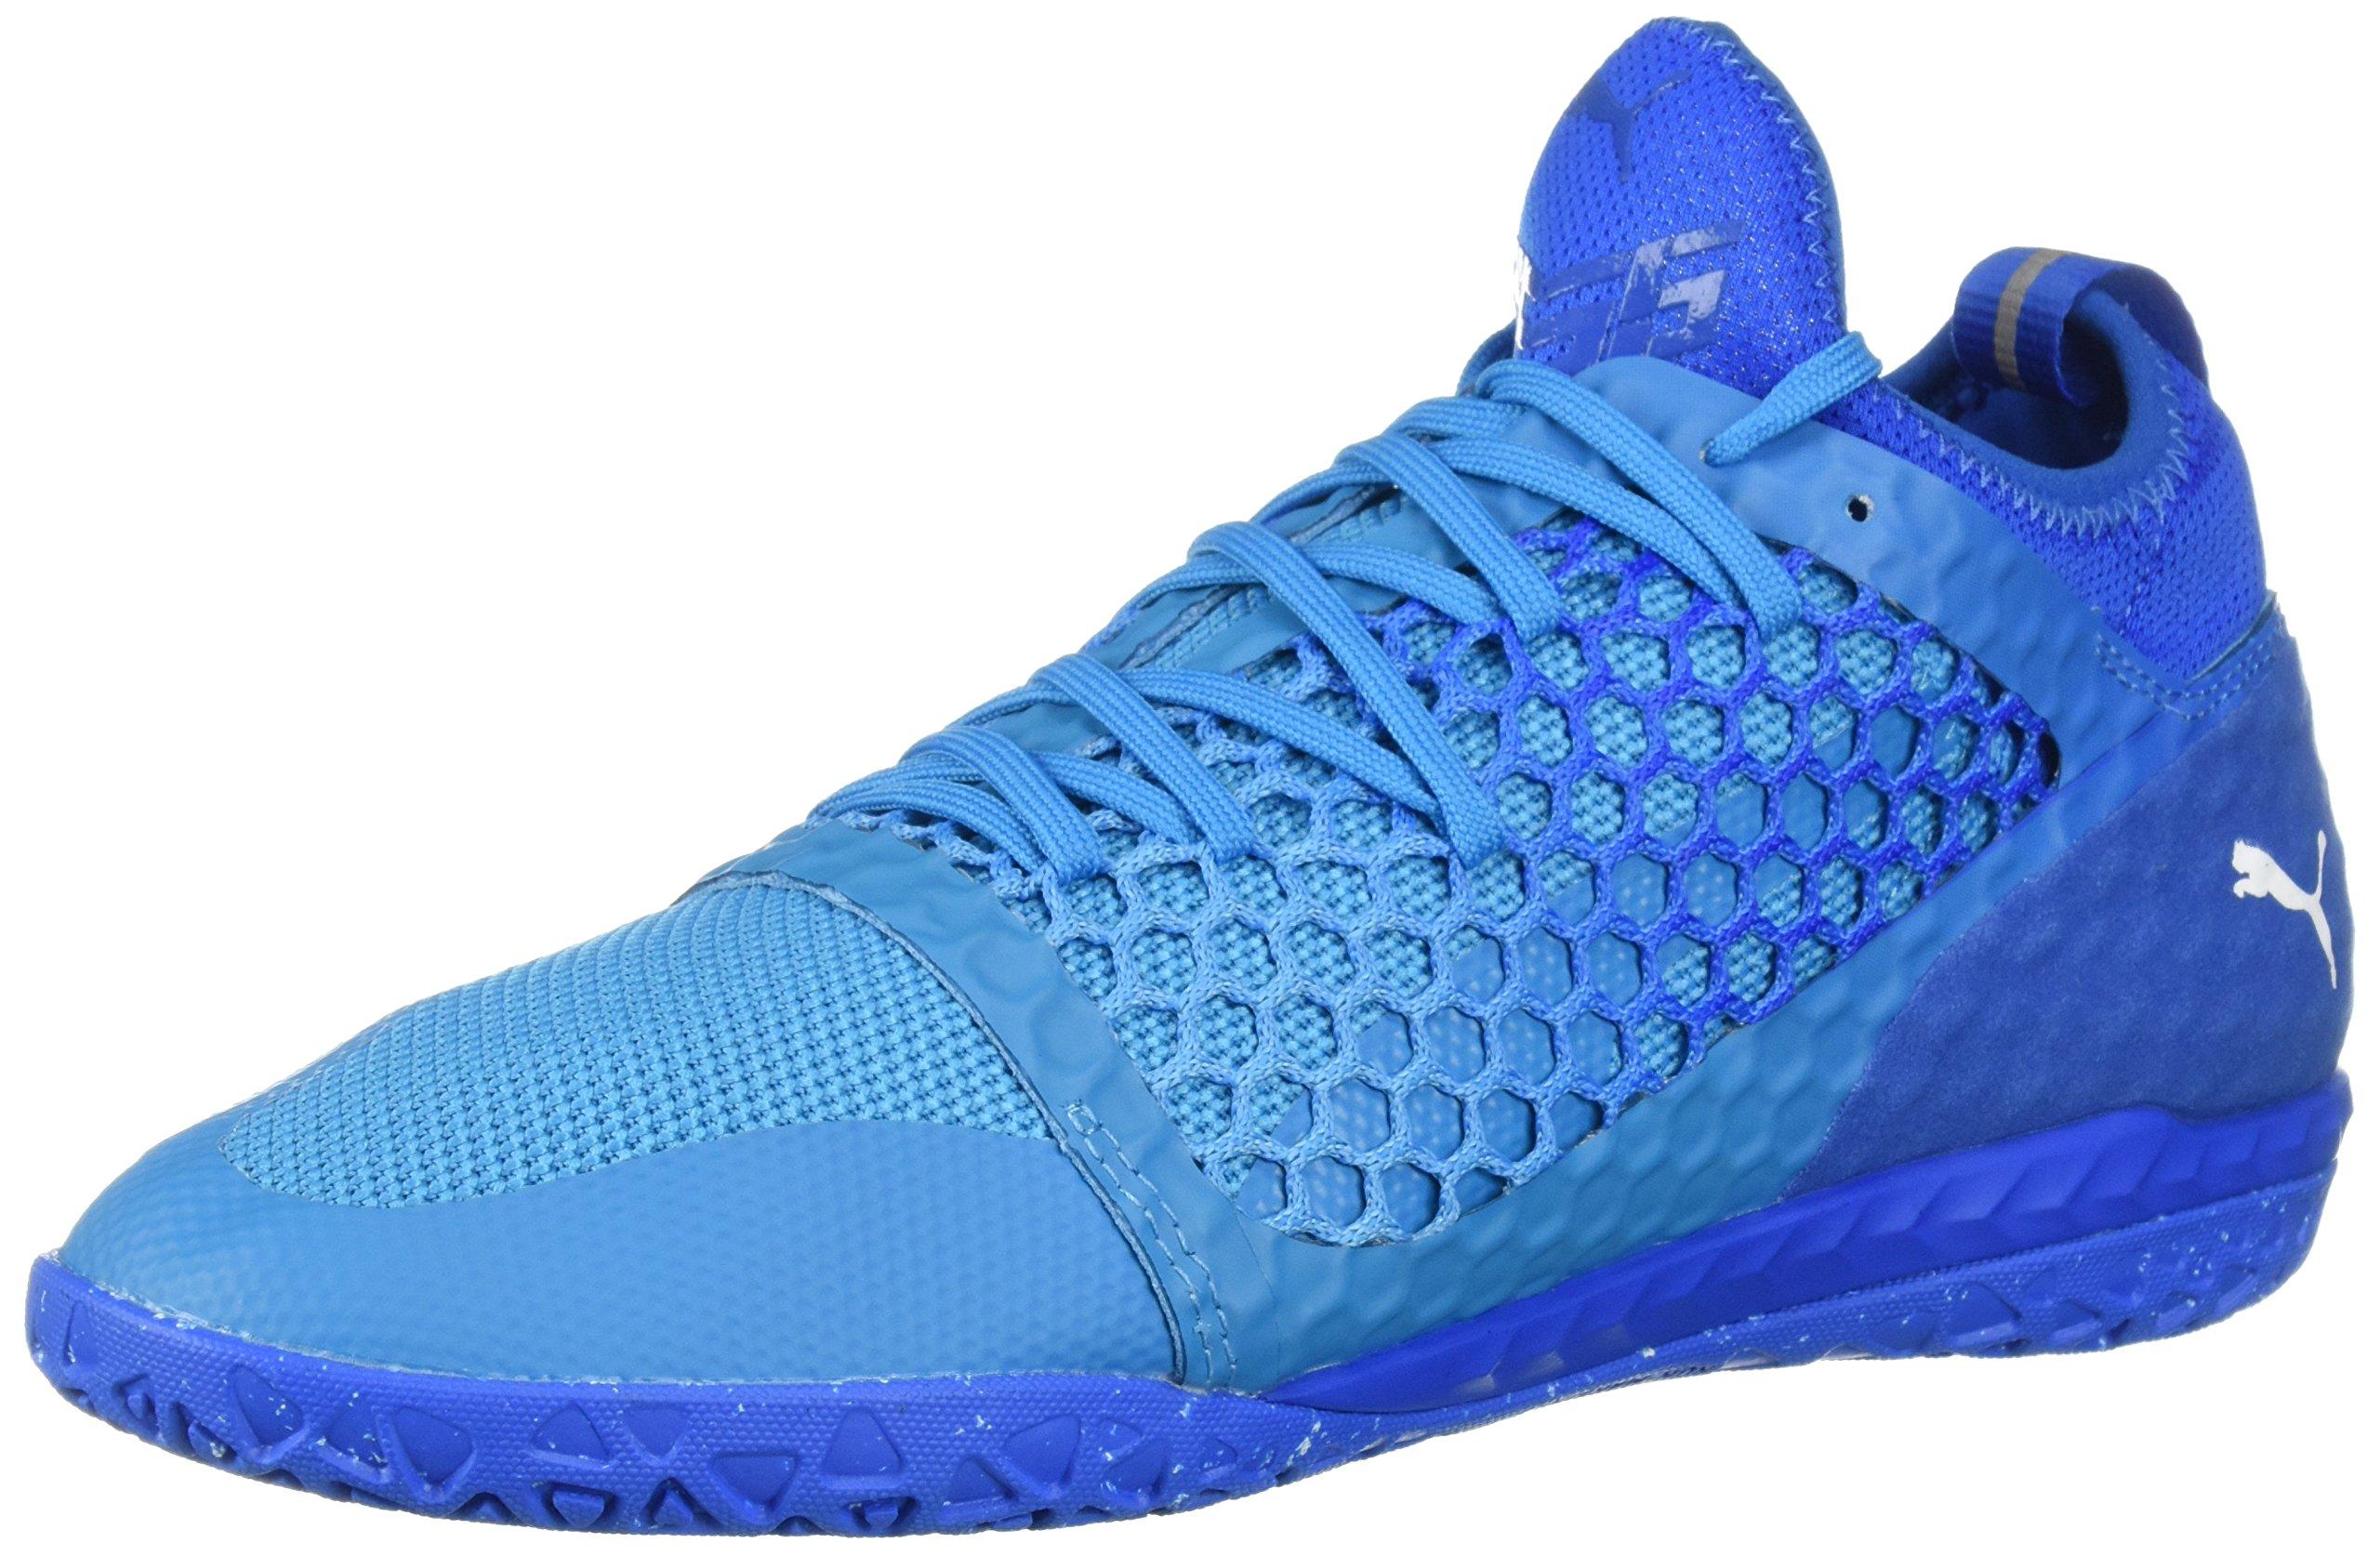 PUMA Men's 365 Ignite Netfit CT Soccer Shoe, Electric Blue Lemonade White-Hawaiian Ocean, 9.5 M US